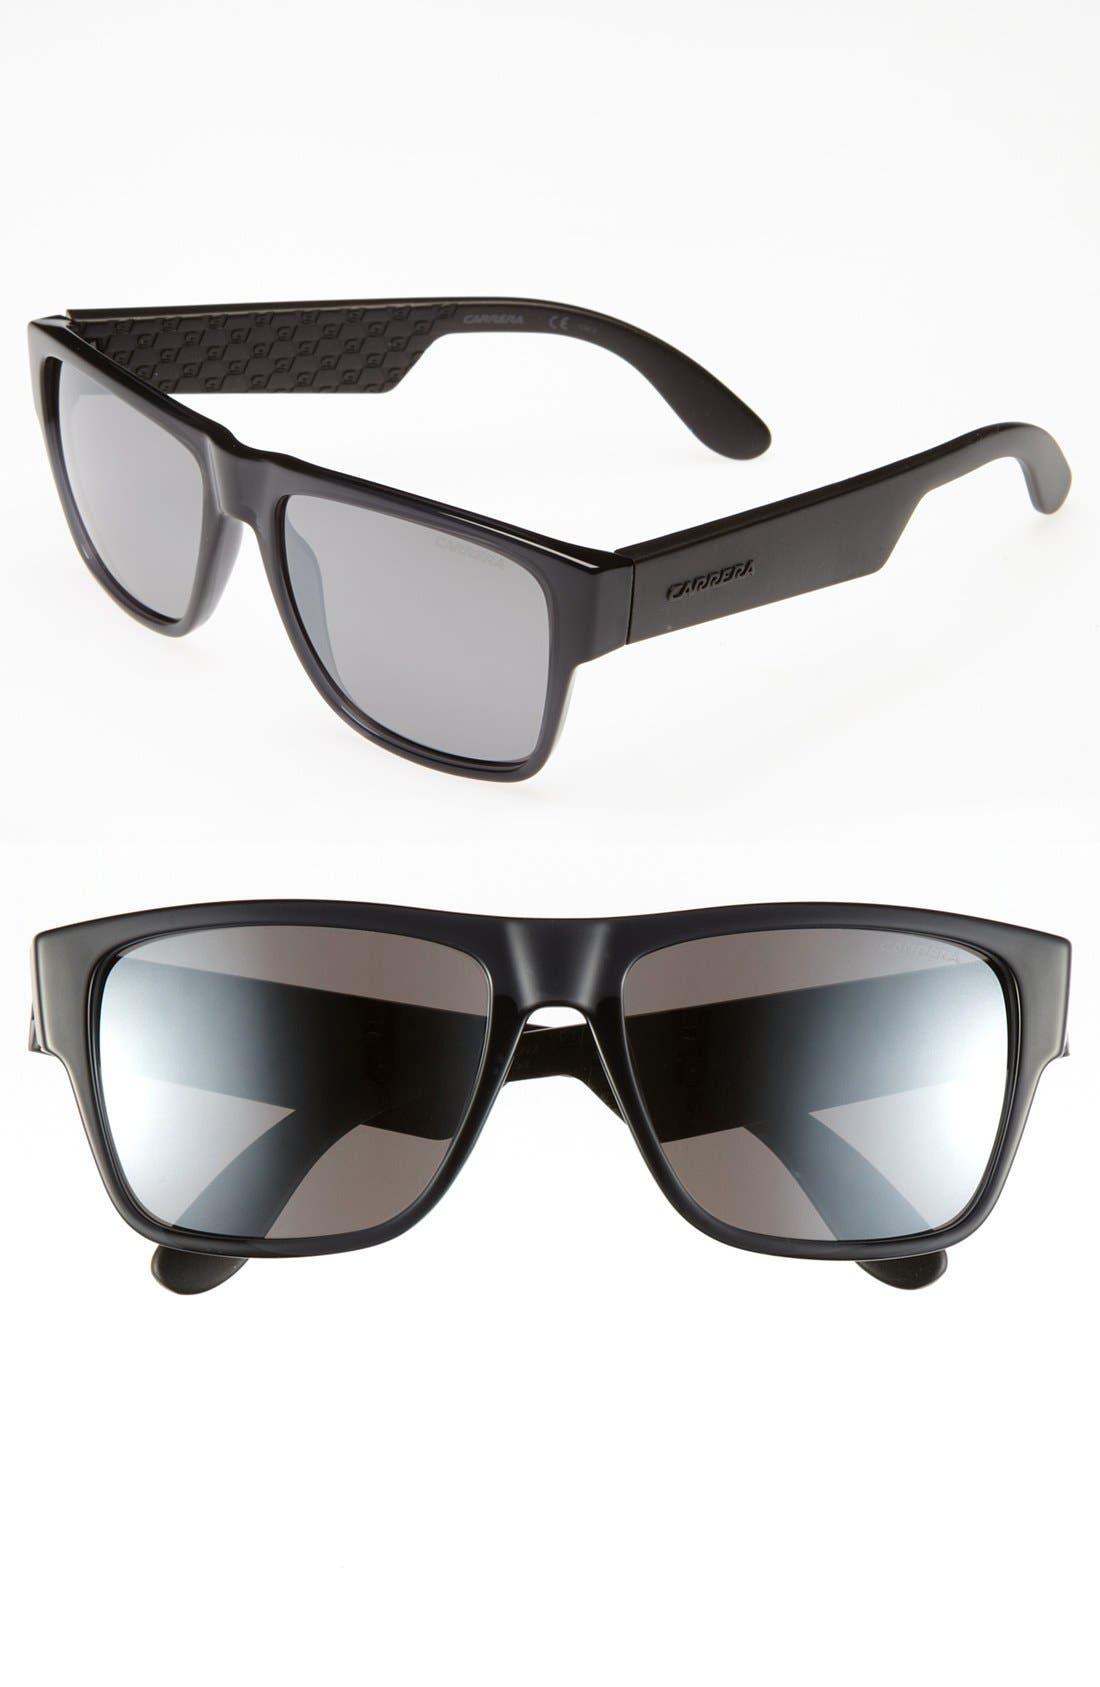 Main Image - Carrera Eyewear 55mm Sunglasses